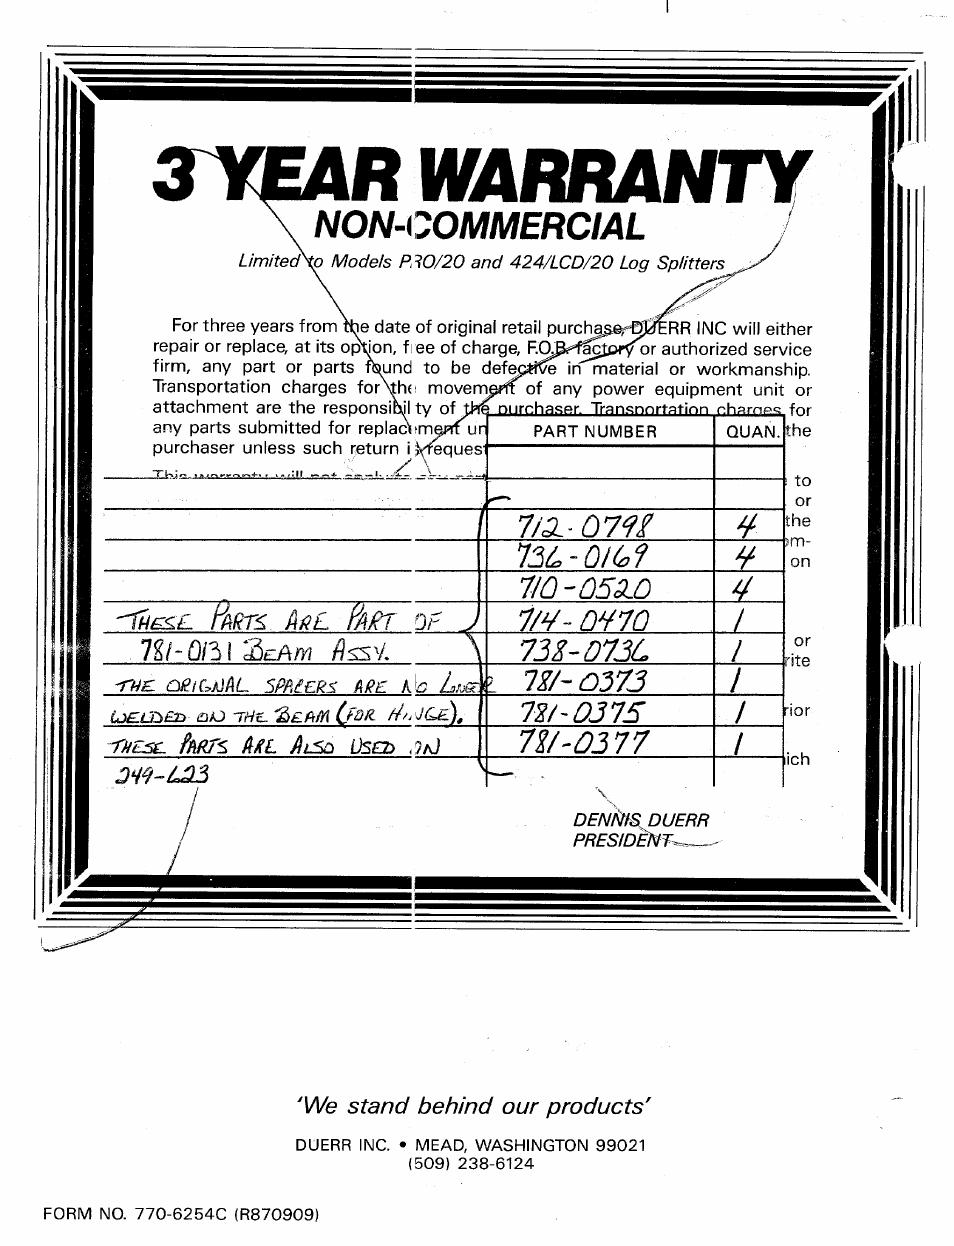 R warranty, Non-commercial, Warranty | MTD Duerr 248-623-003 User Manual |  Page 16 / 16